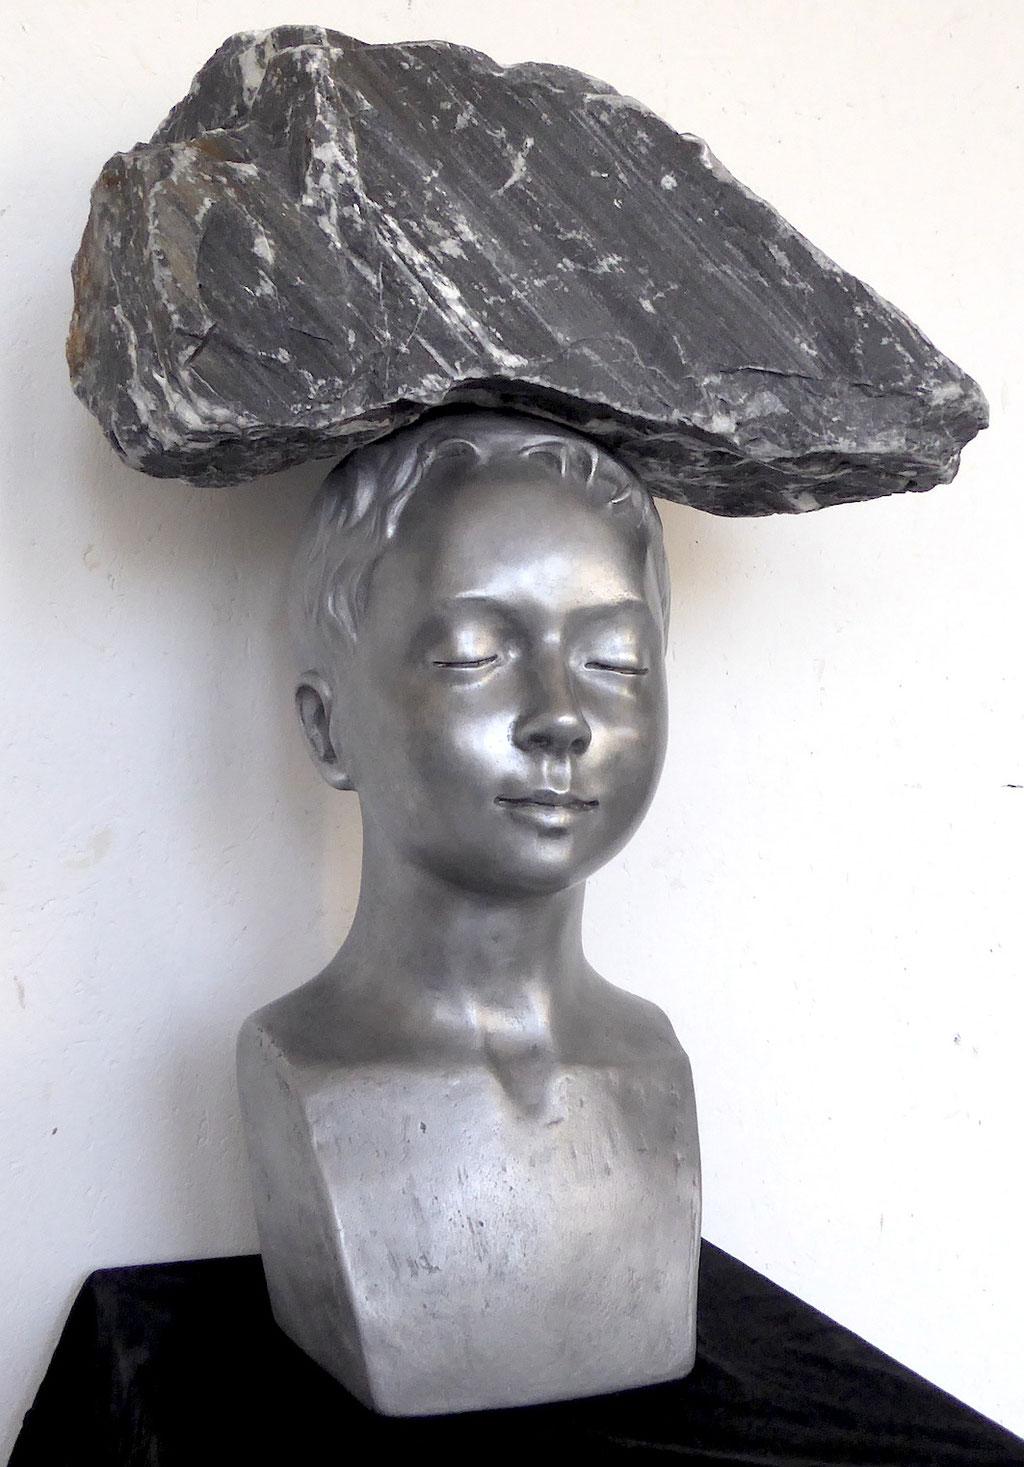 Knabe mit Fels, ca. 60x35x30cm, Aluminiumguss/Stein, 2018